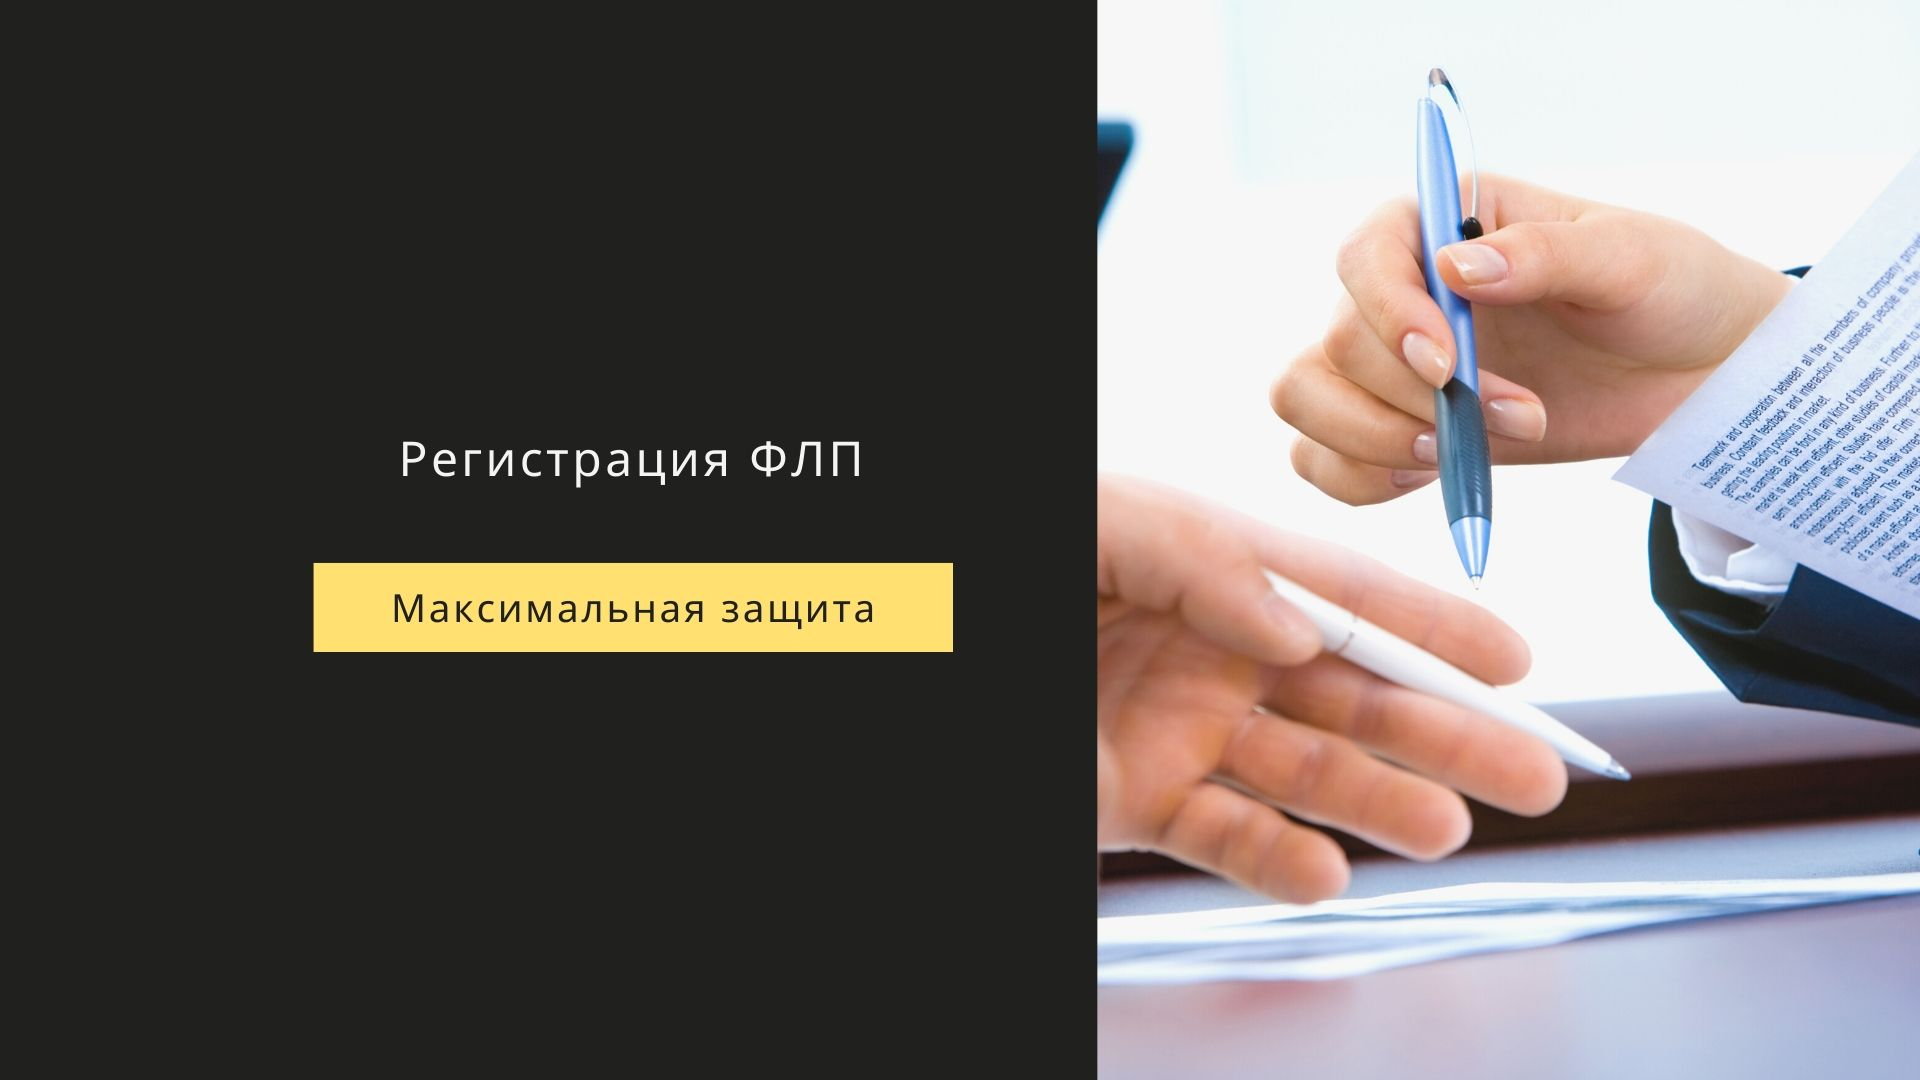 registration_flp